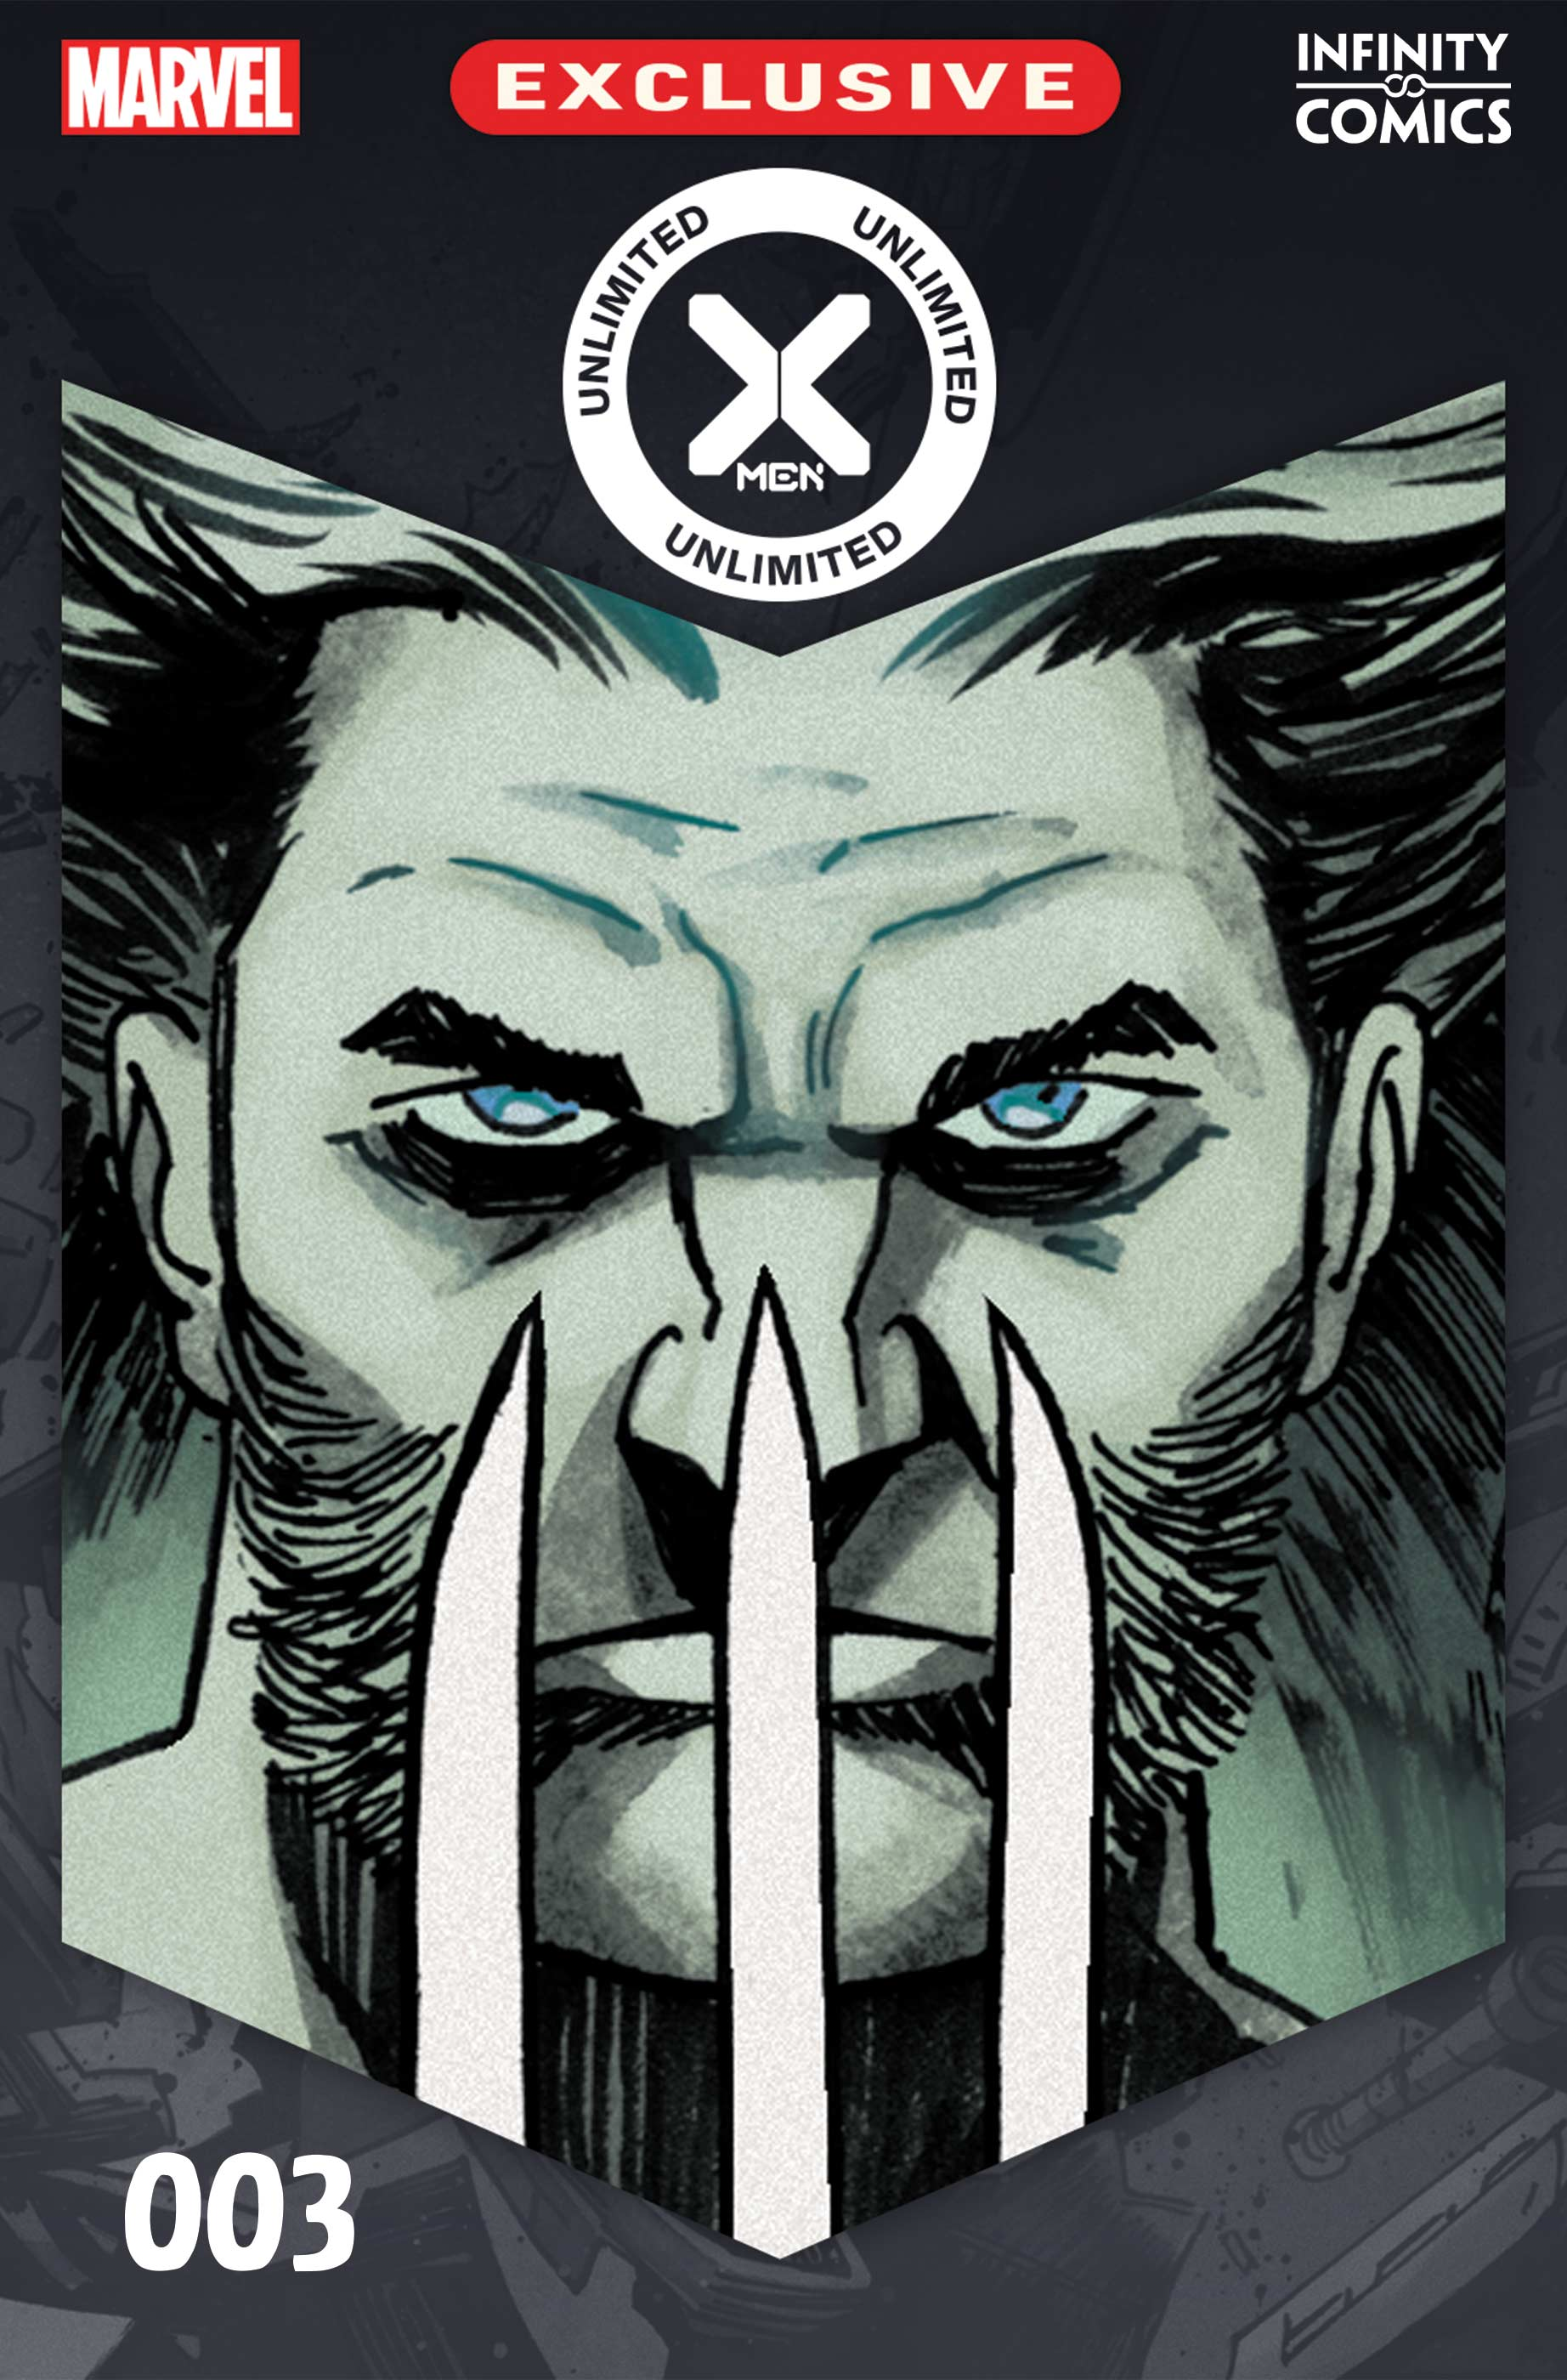 X-Men Unlimited Infinity Comic (2021) #3